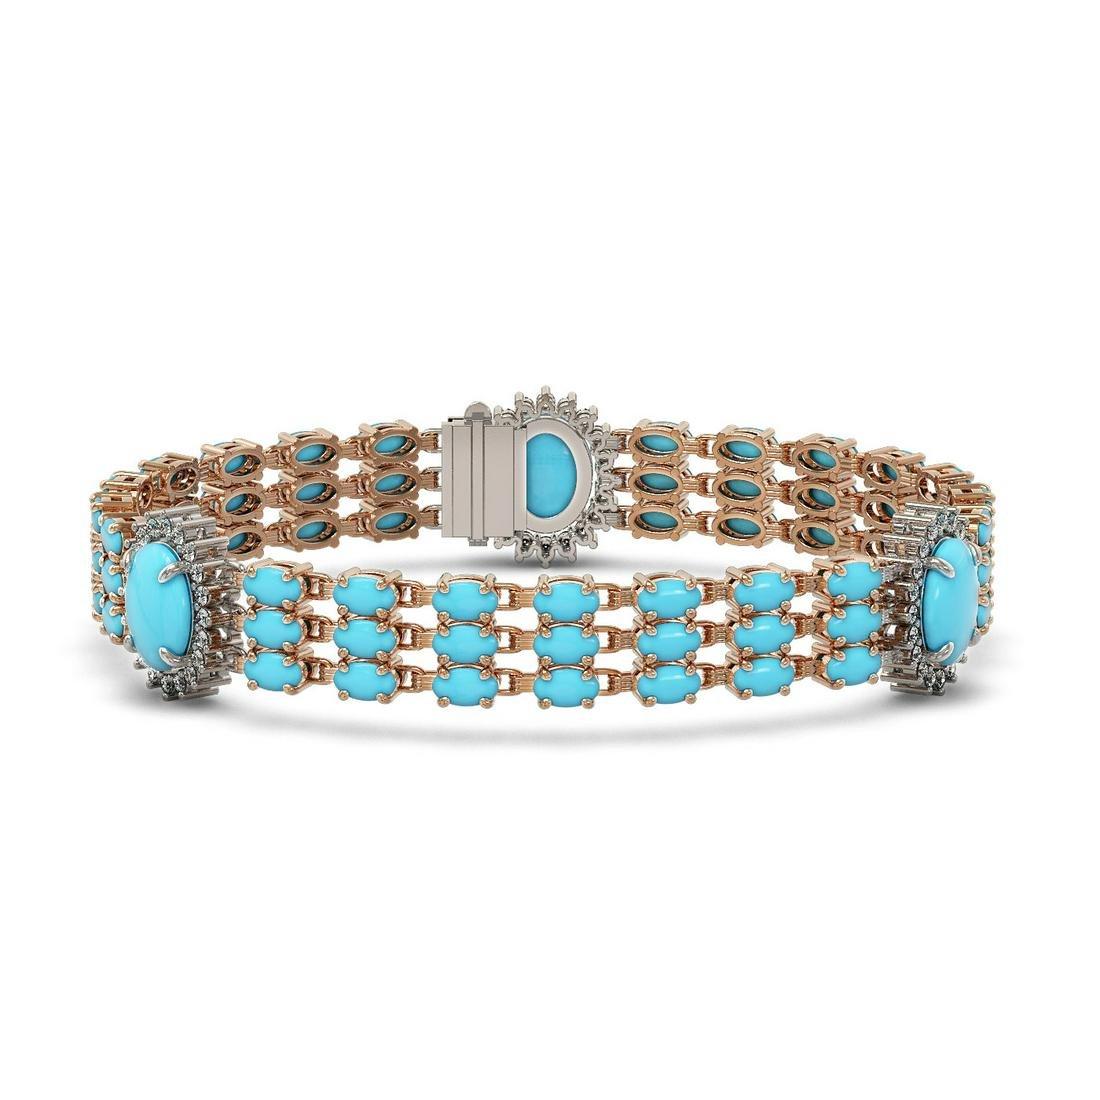 23.14 ctw Turquoise & Diamond Bracelet 14K Rose Gold